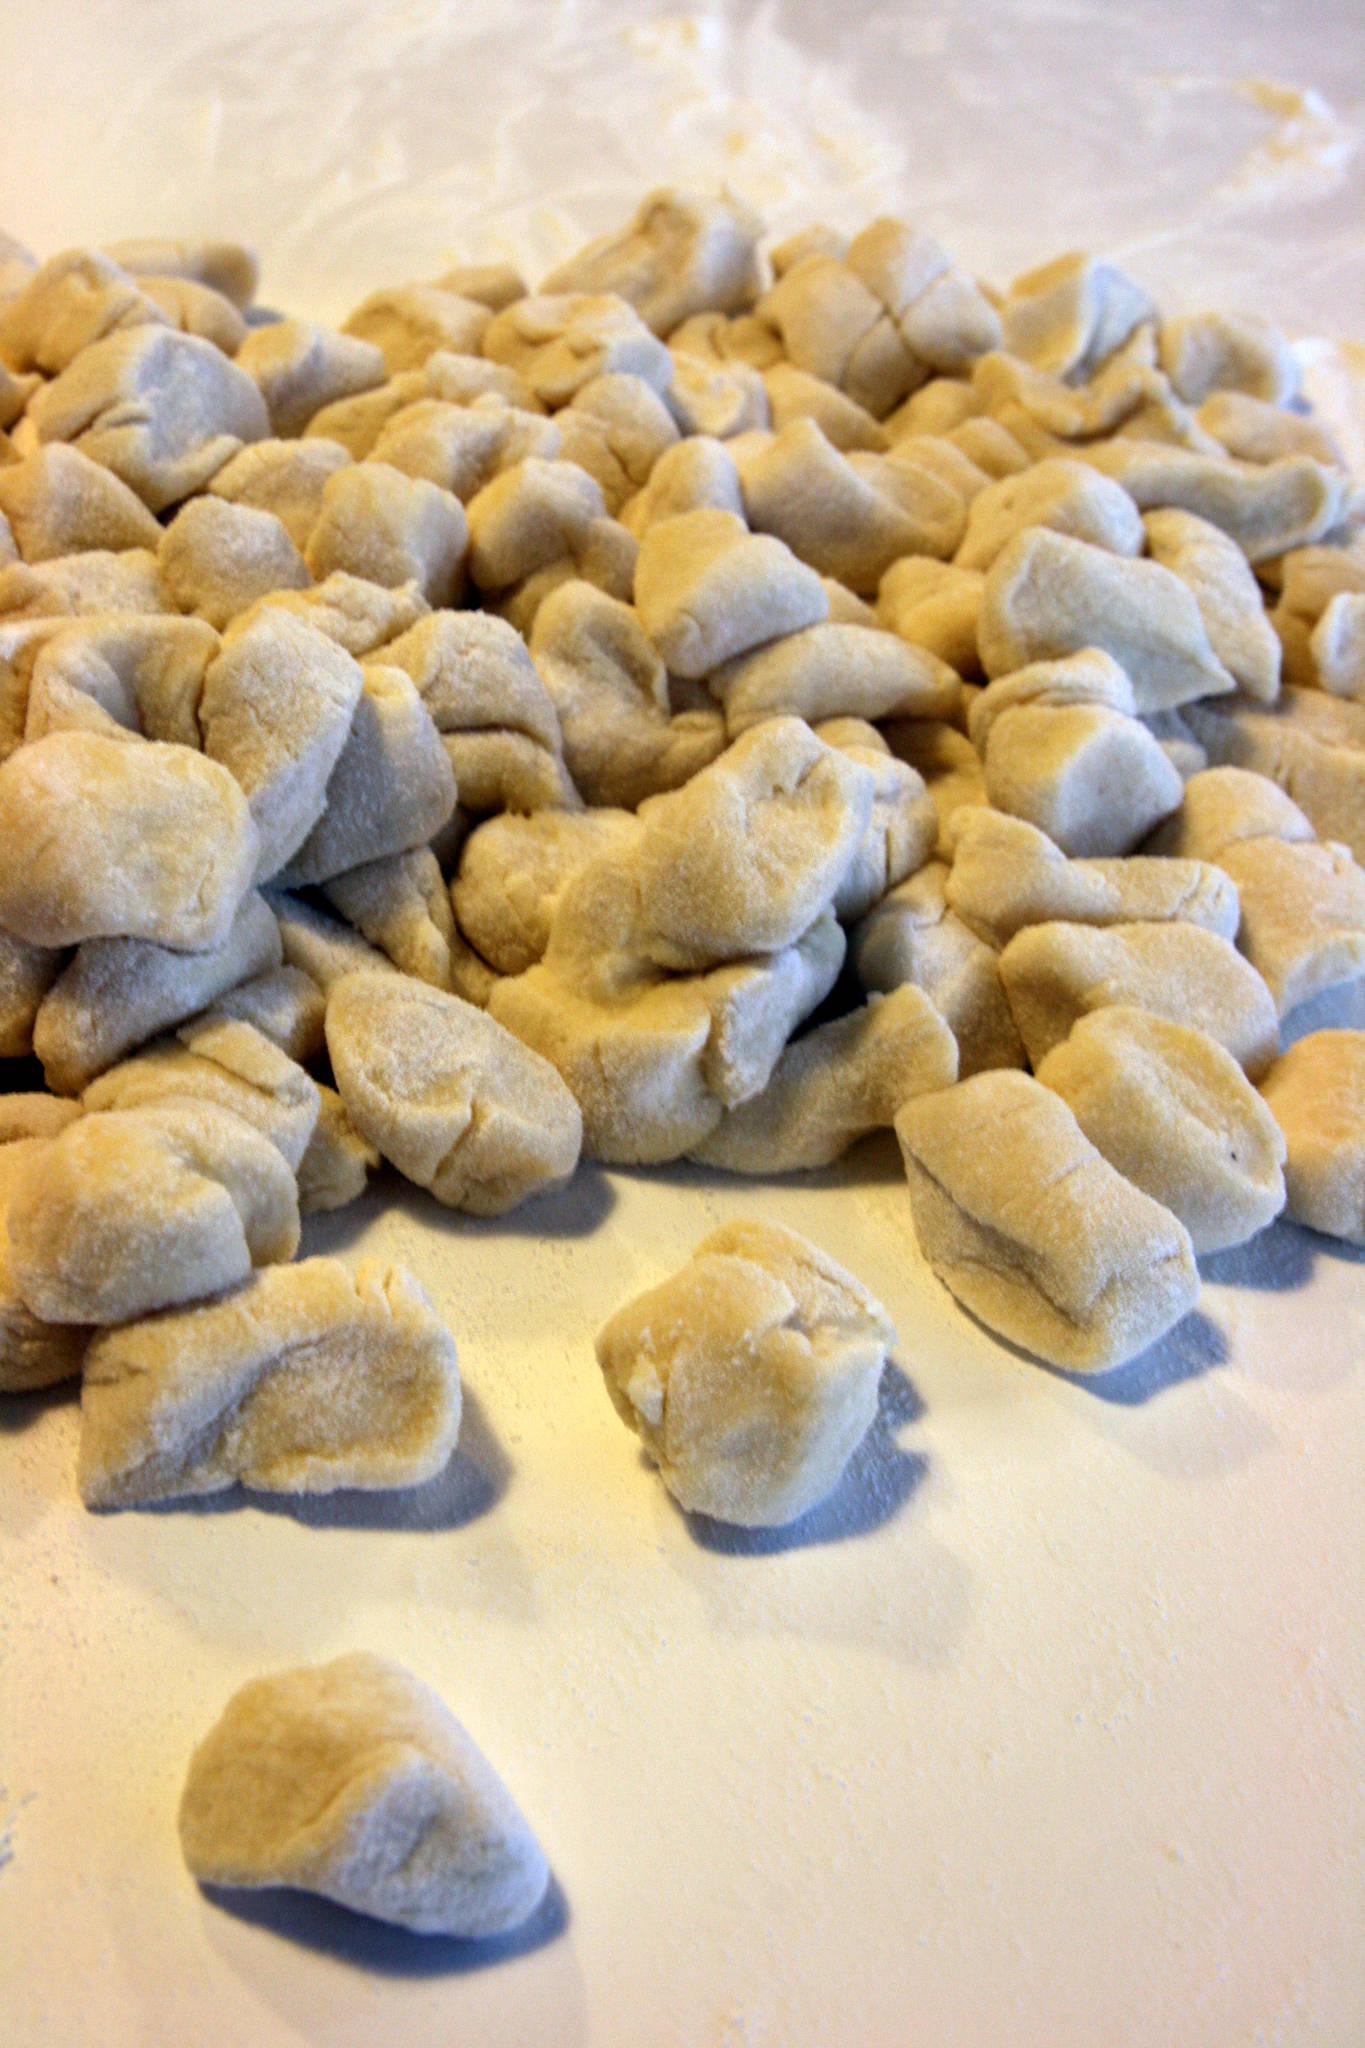 Gnocchis di patate